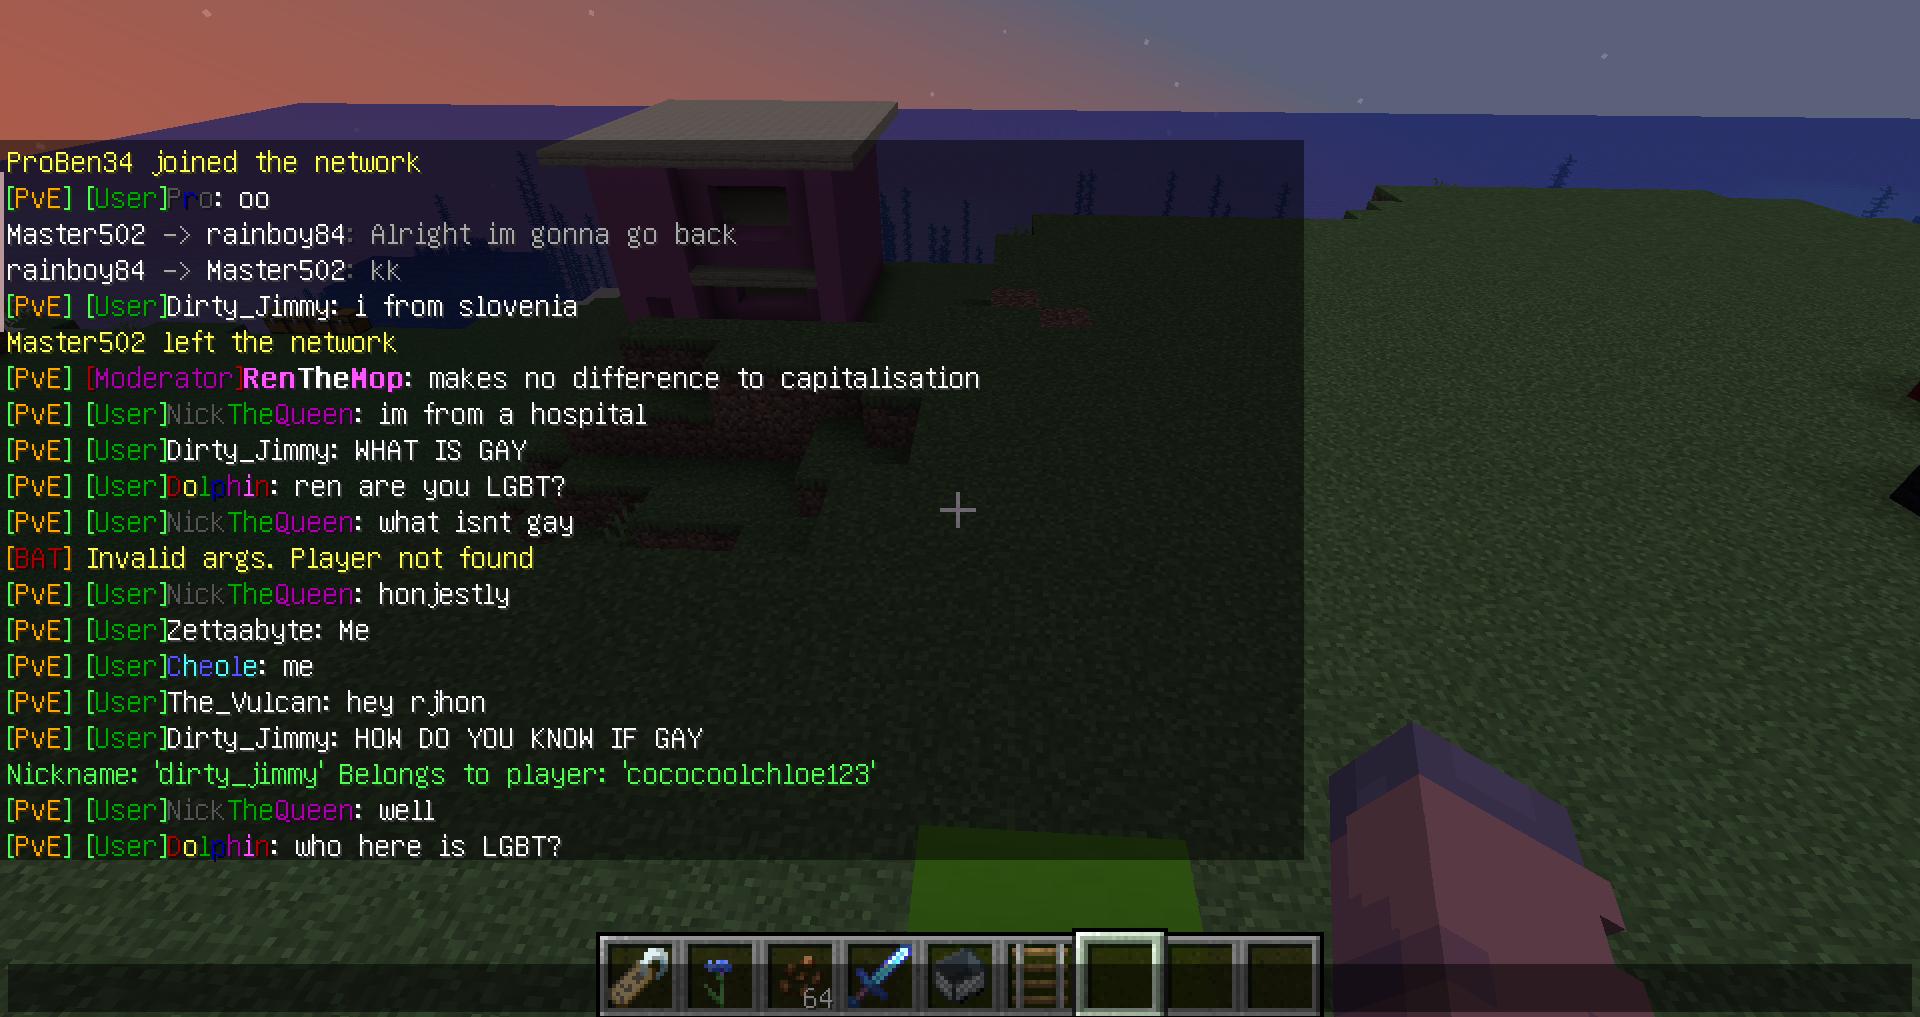 screenshot of chat